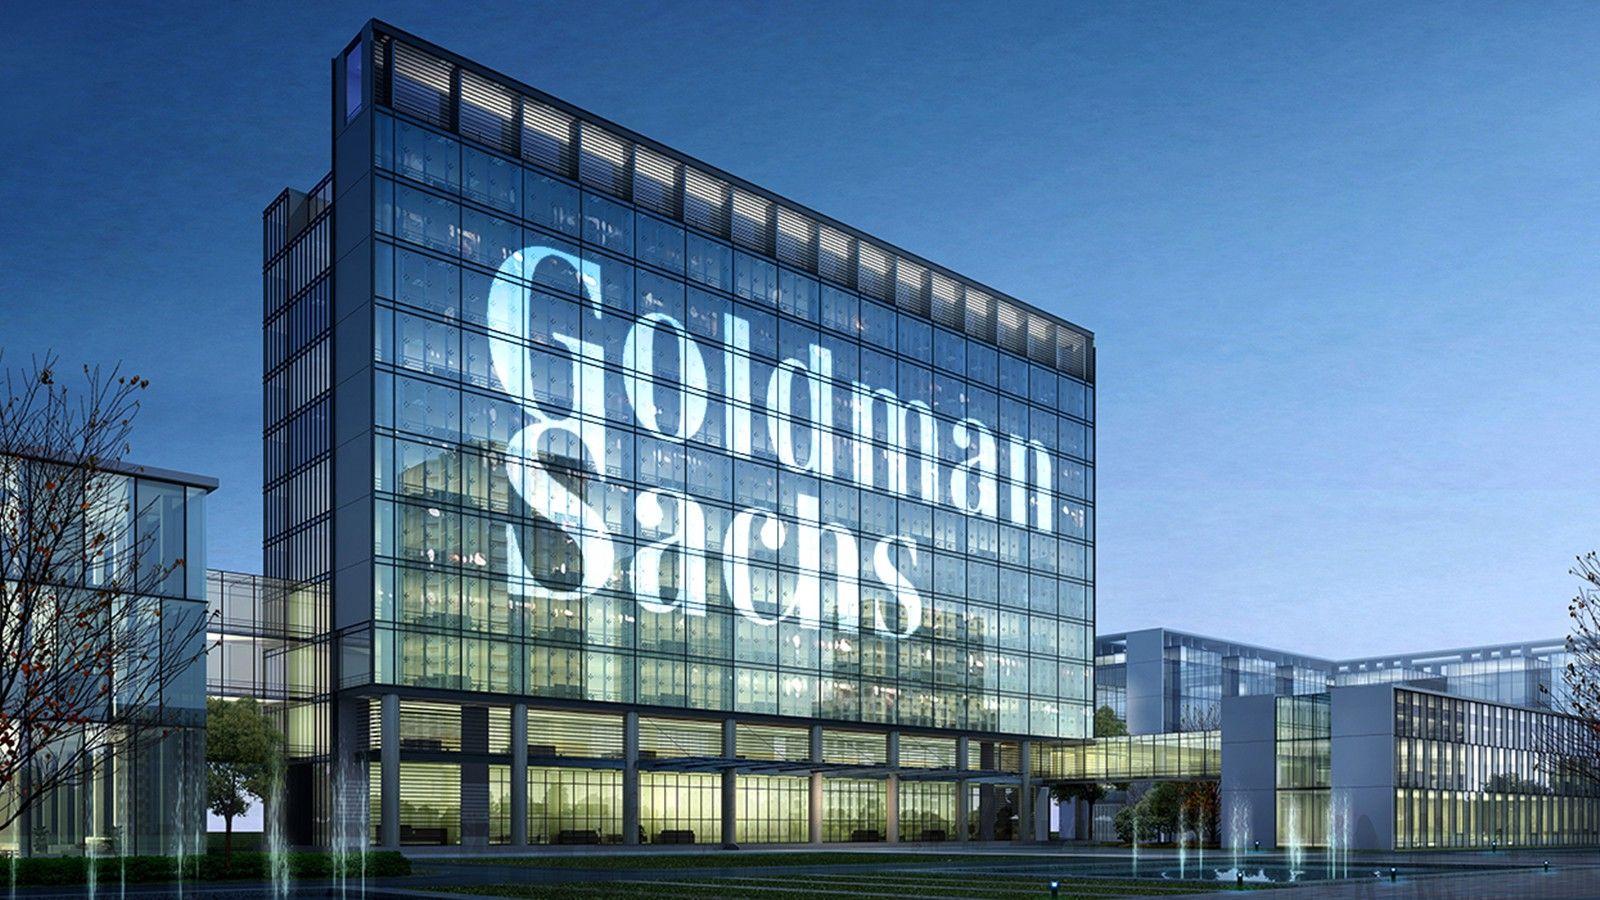 Explore a new career path with Goldman Sachs Returnship® Program!